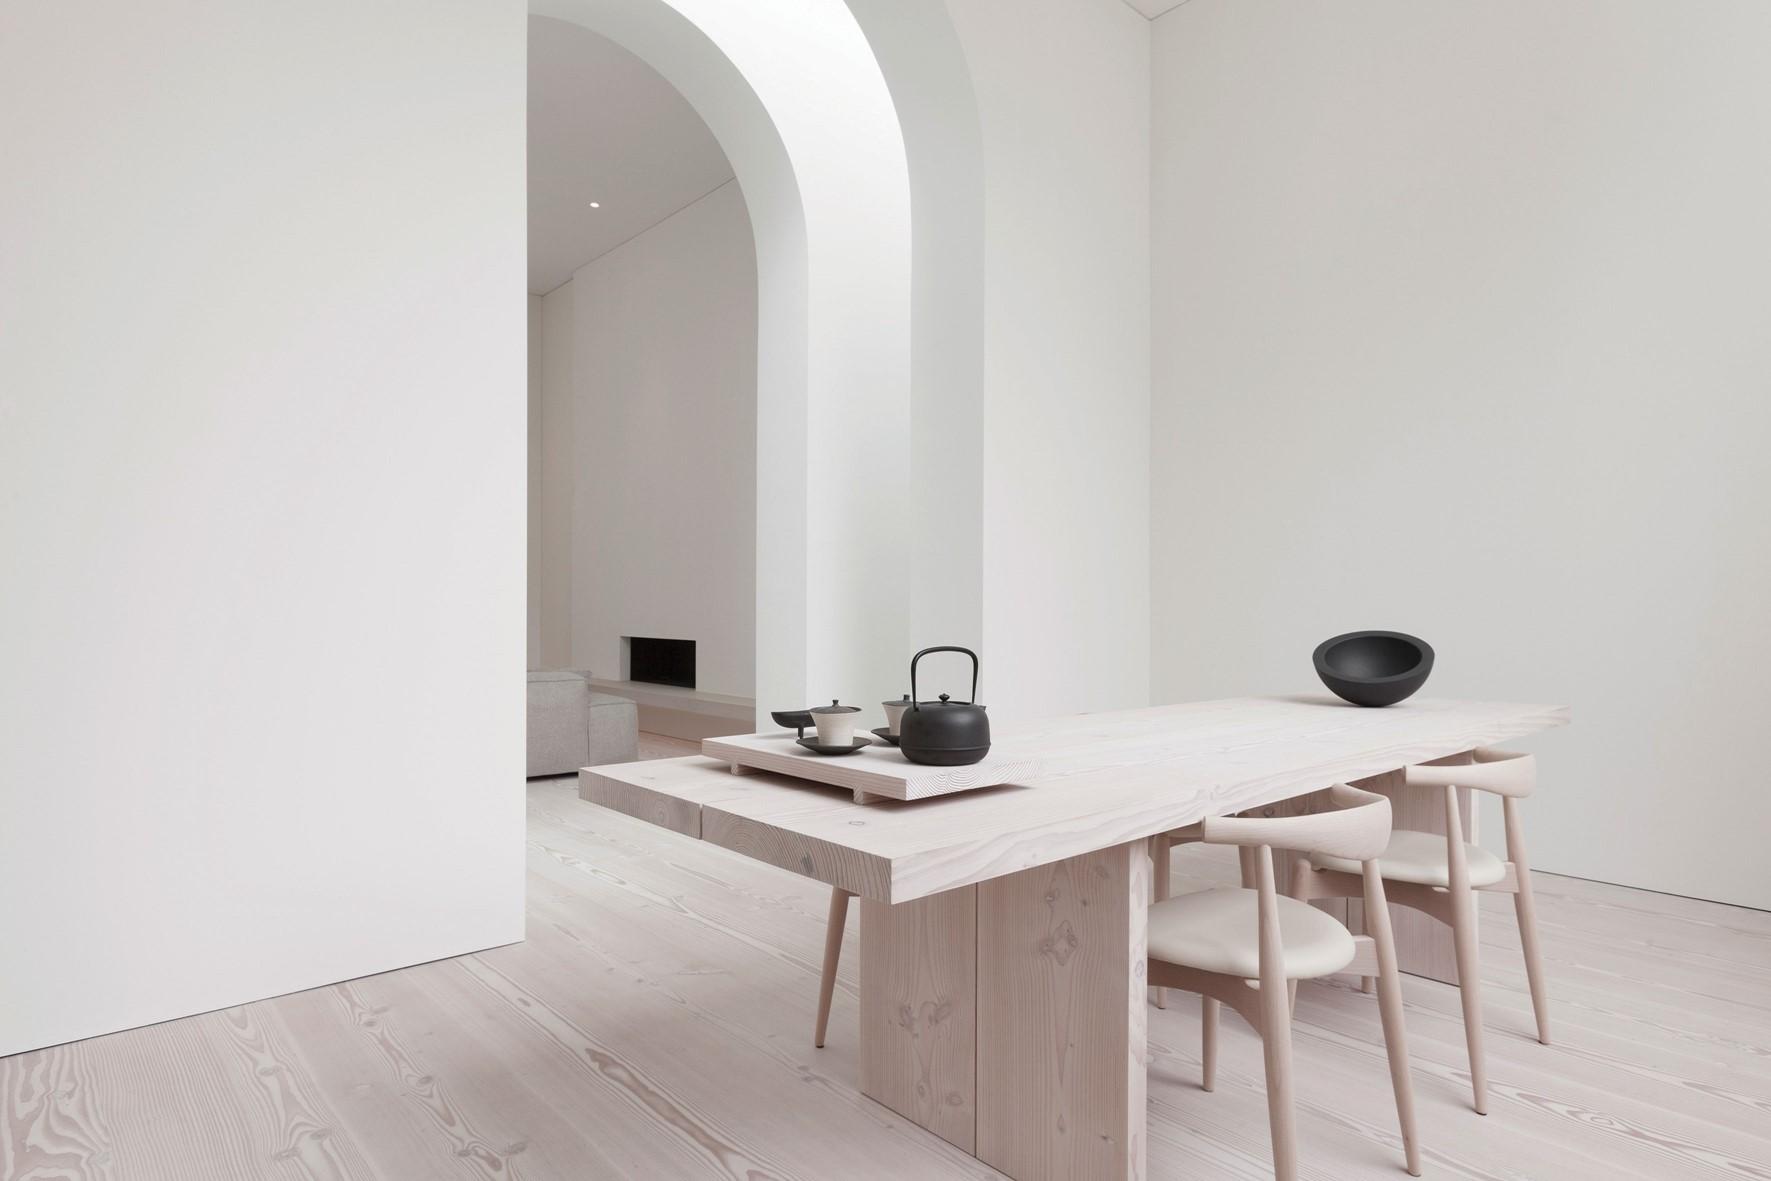 douglas-plank-floor_lya-and-natural-oil_coach-house-amsterdam_plank-table_dinesen.jpg